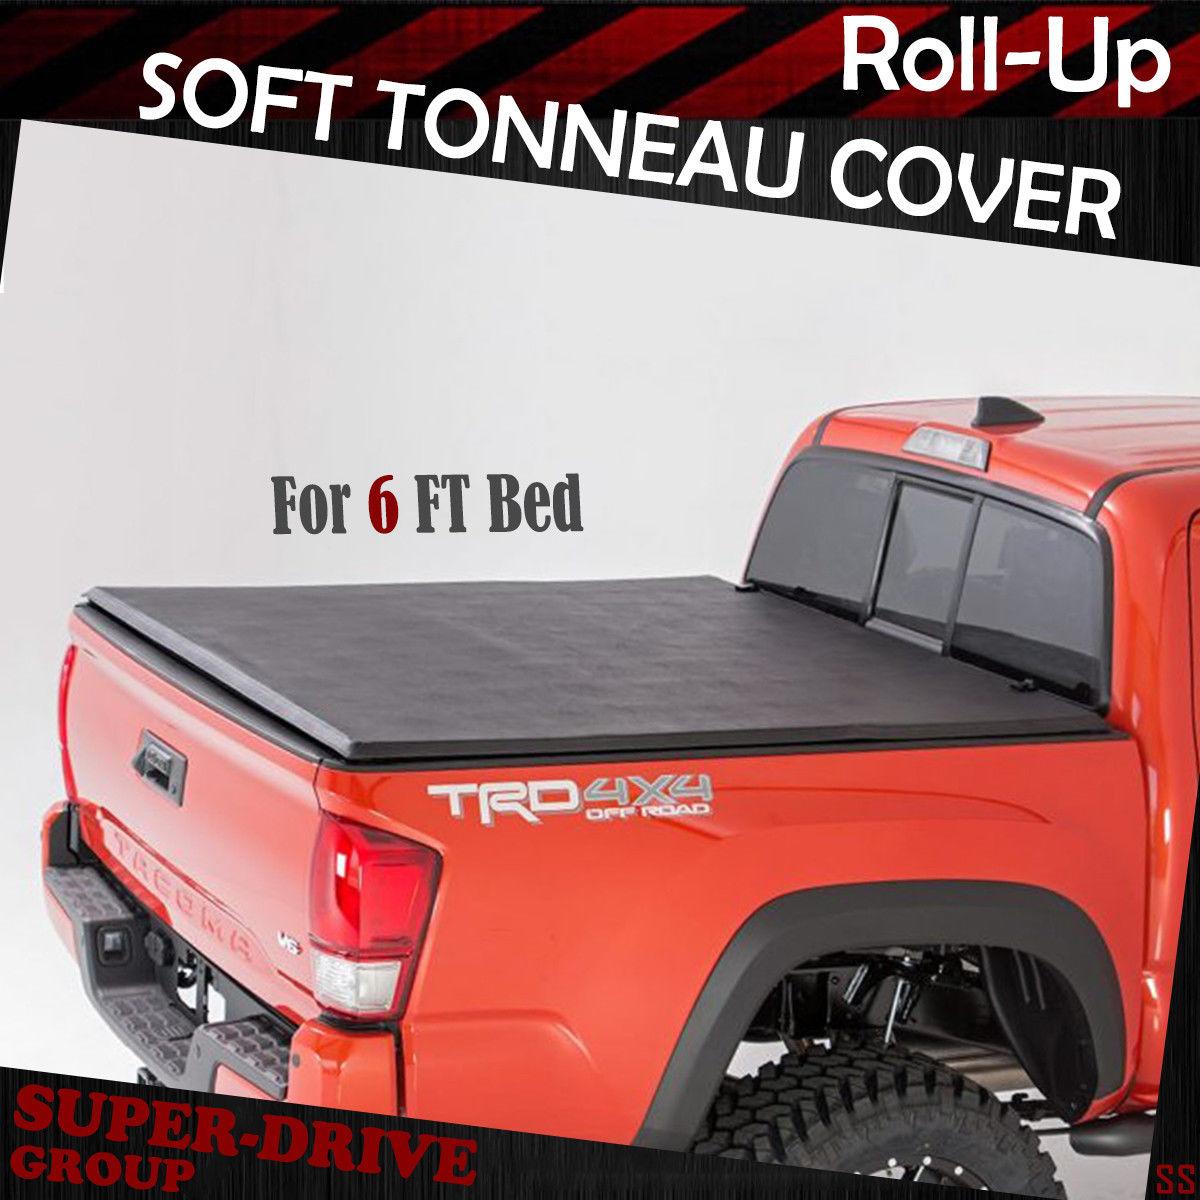 Auto Parts And Vehicles Soft Tri Fold Tonneau Assemble Cover For